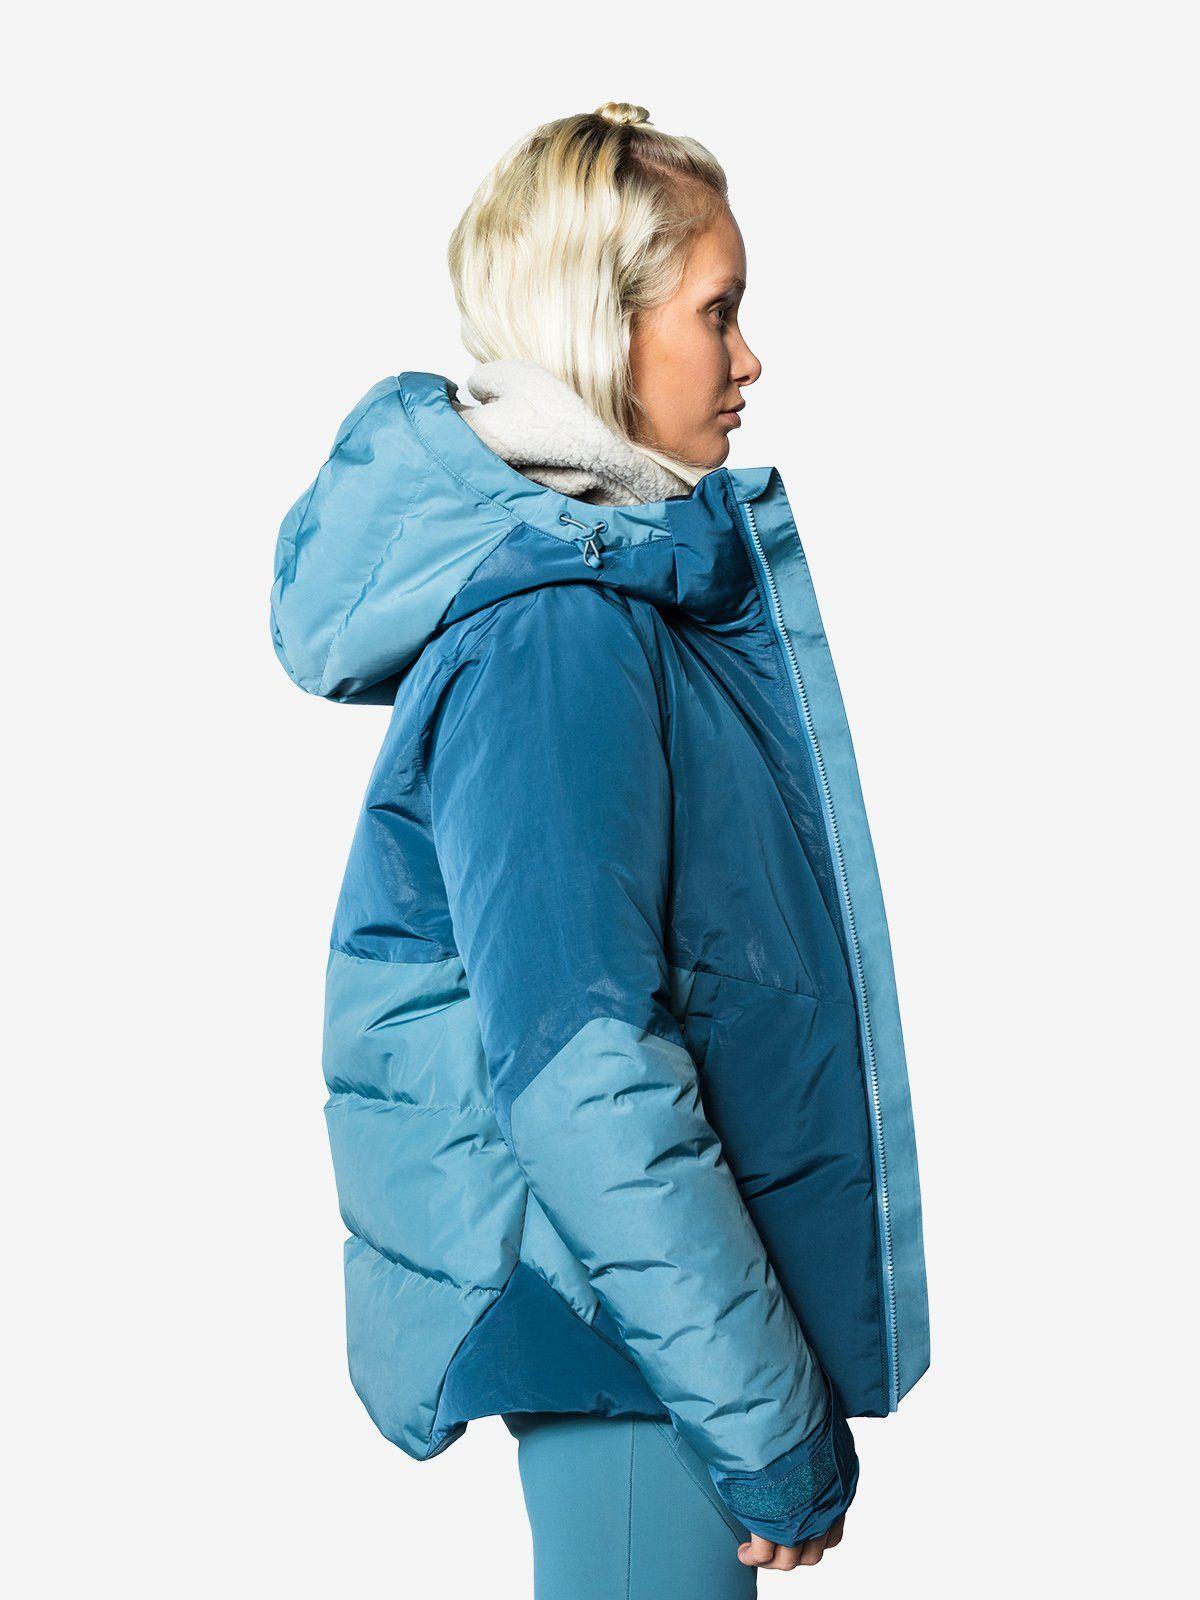 Womens Ashley Down Jacket In 2021 Holden Outerwear Down Jacket Jackets [ 1600 x 1200 Pixel ]